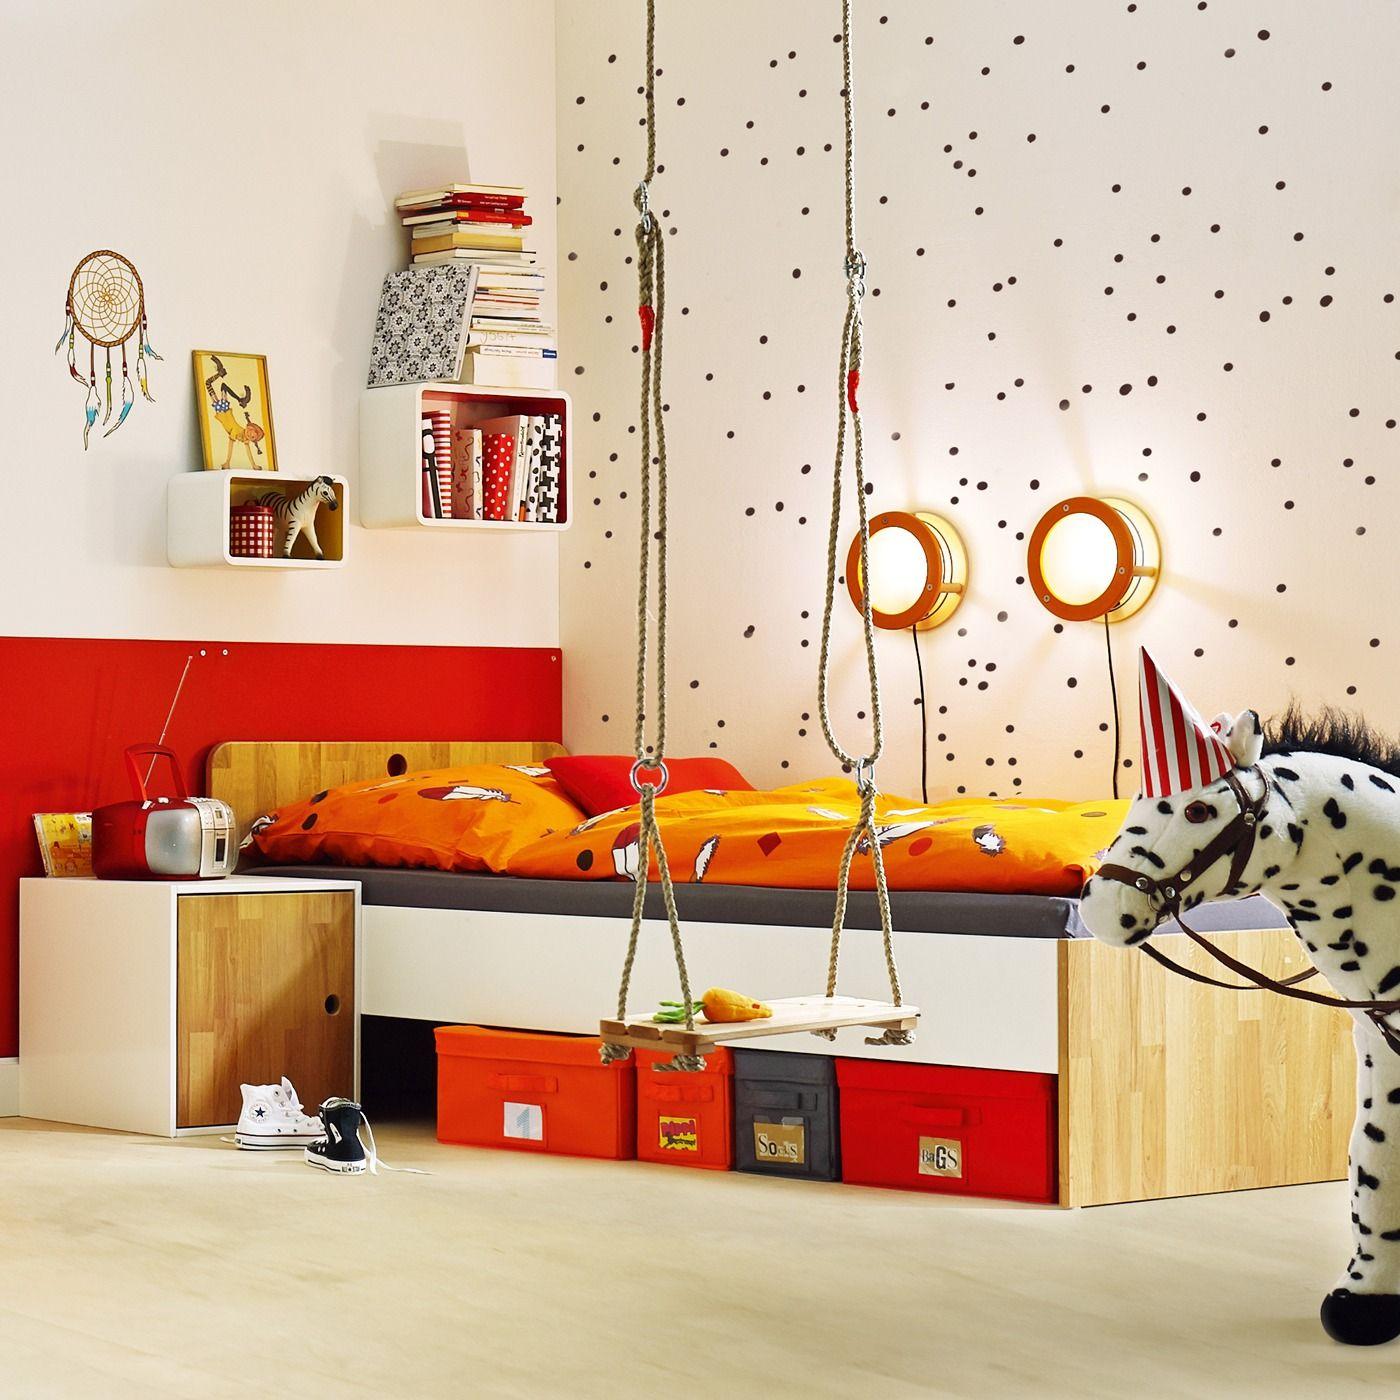 Pippi Langstrumpf Kinderzimmer | Harlow\'s Pirate Pippi room ...